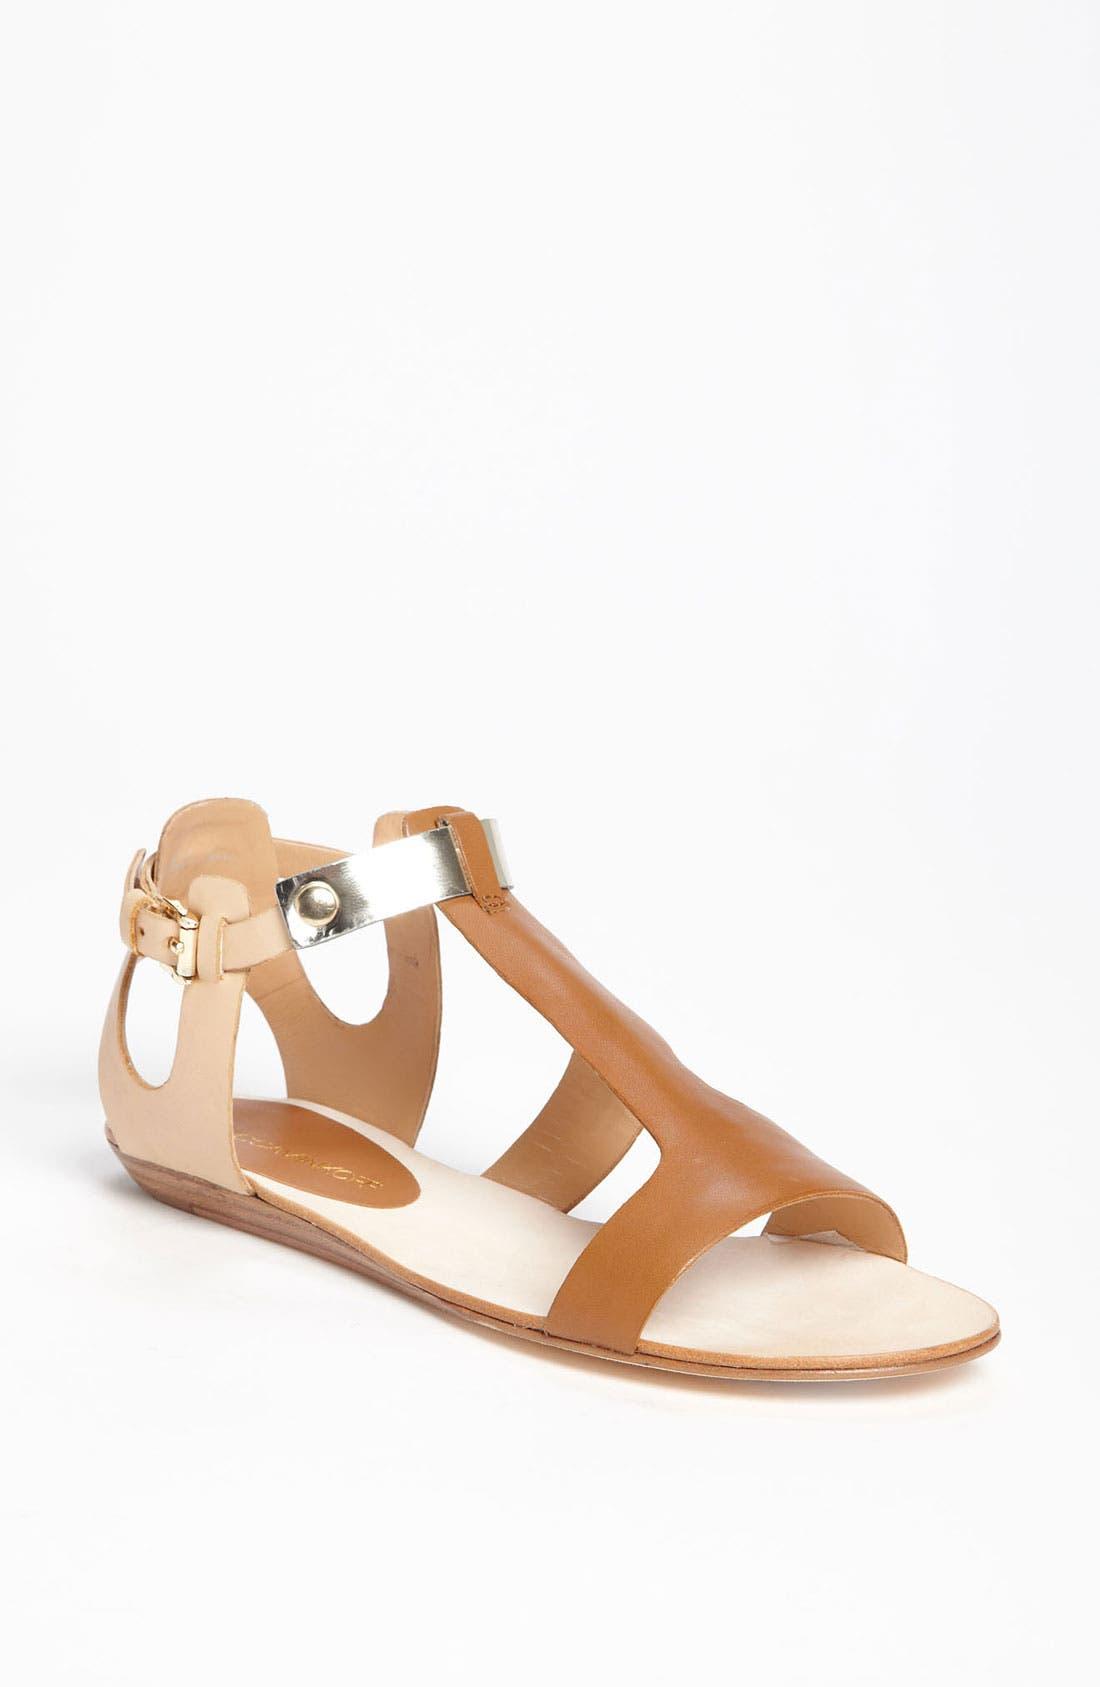 Main Image - Rebecca Minkoff 'Bardot' Sandal